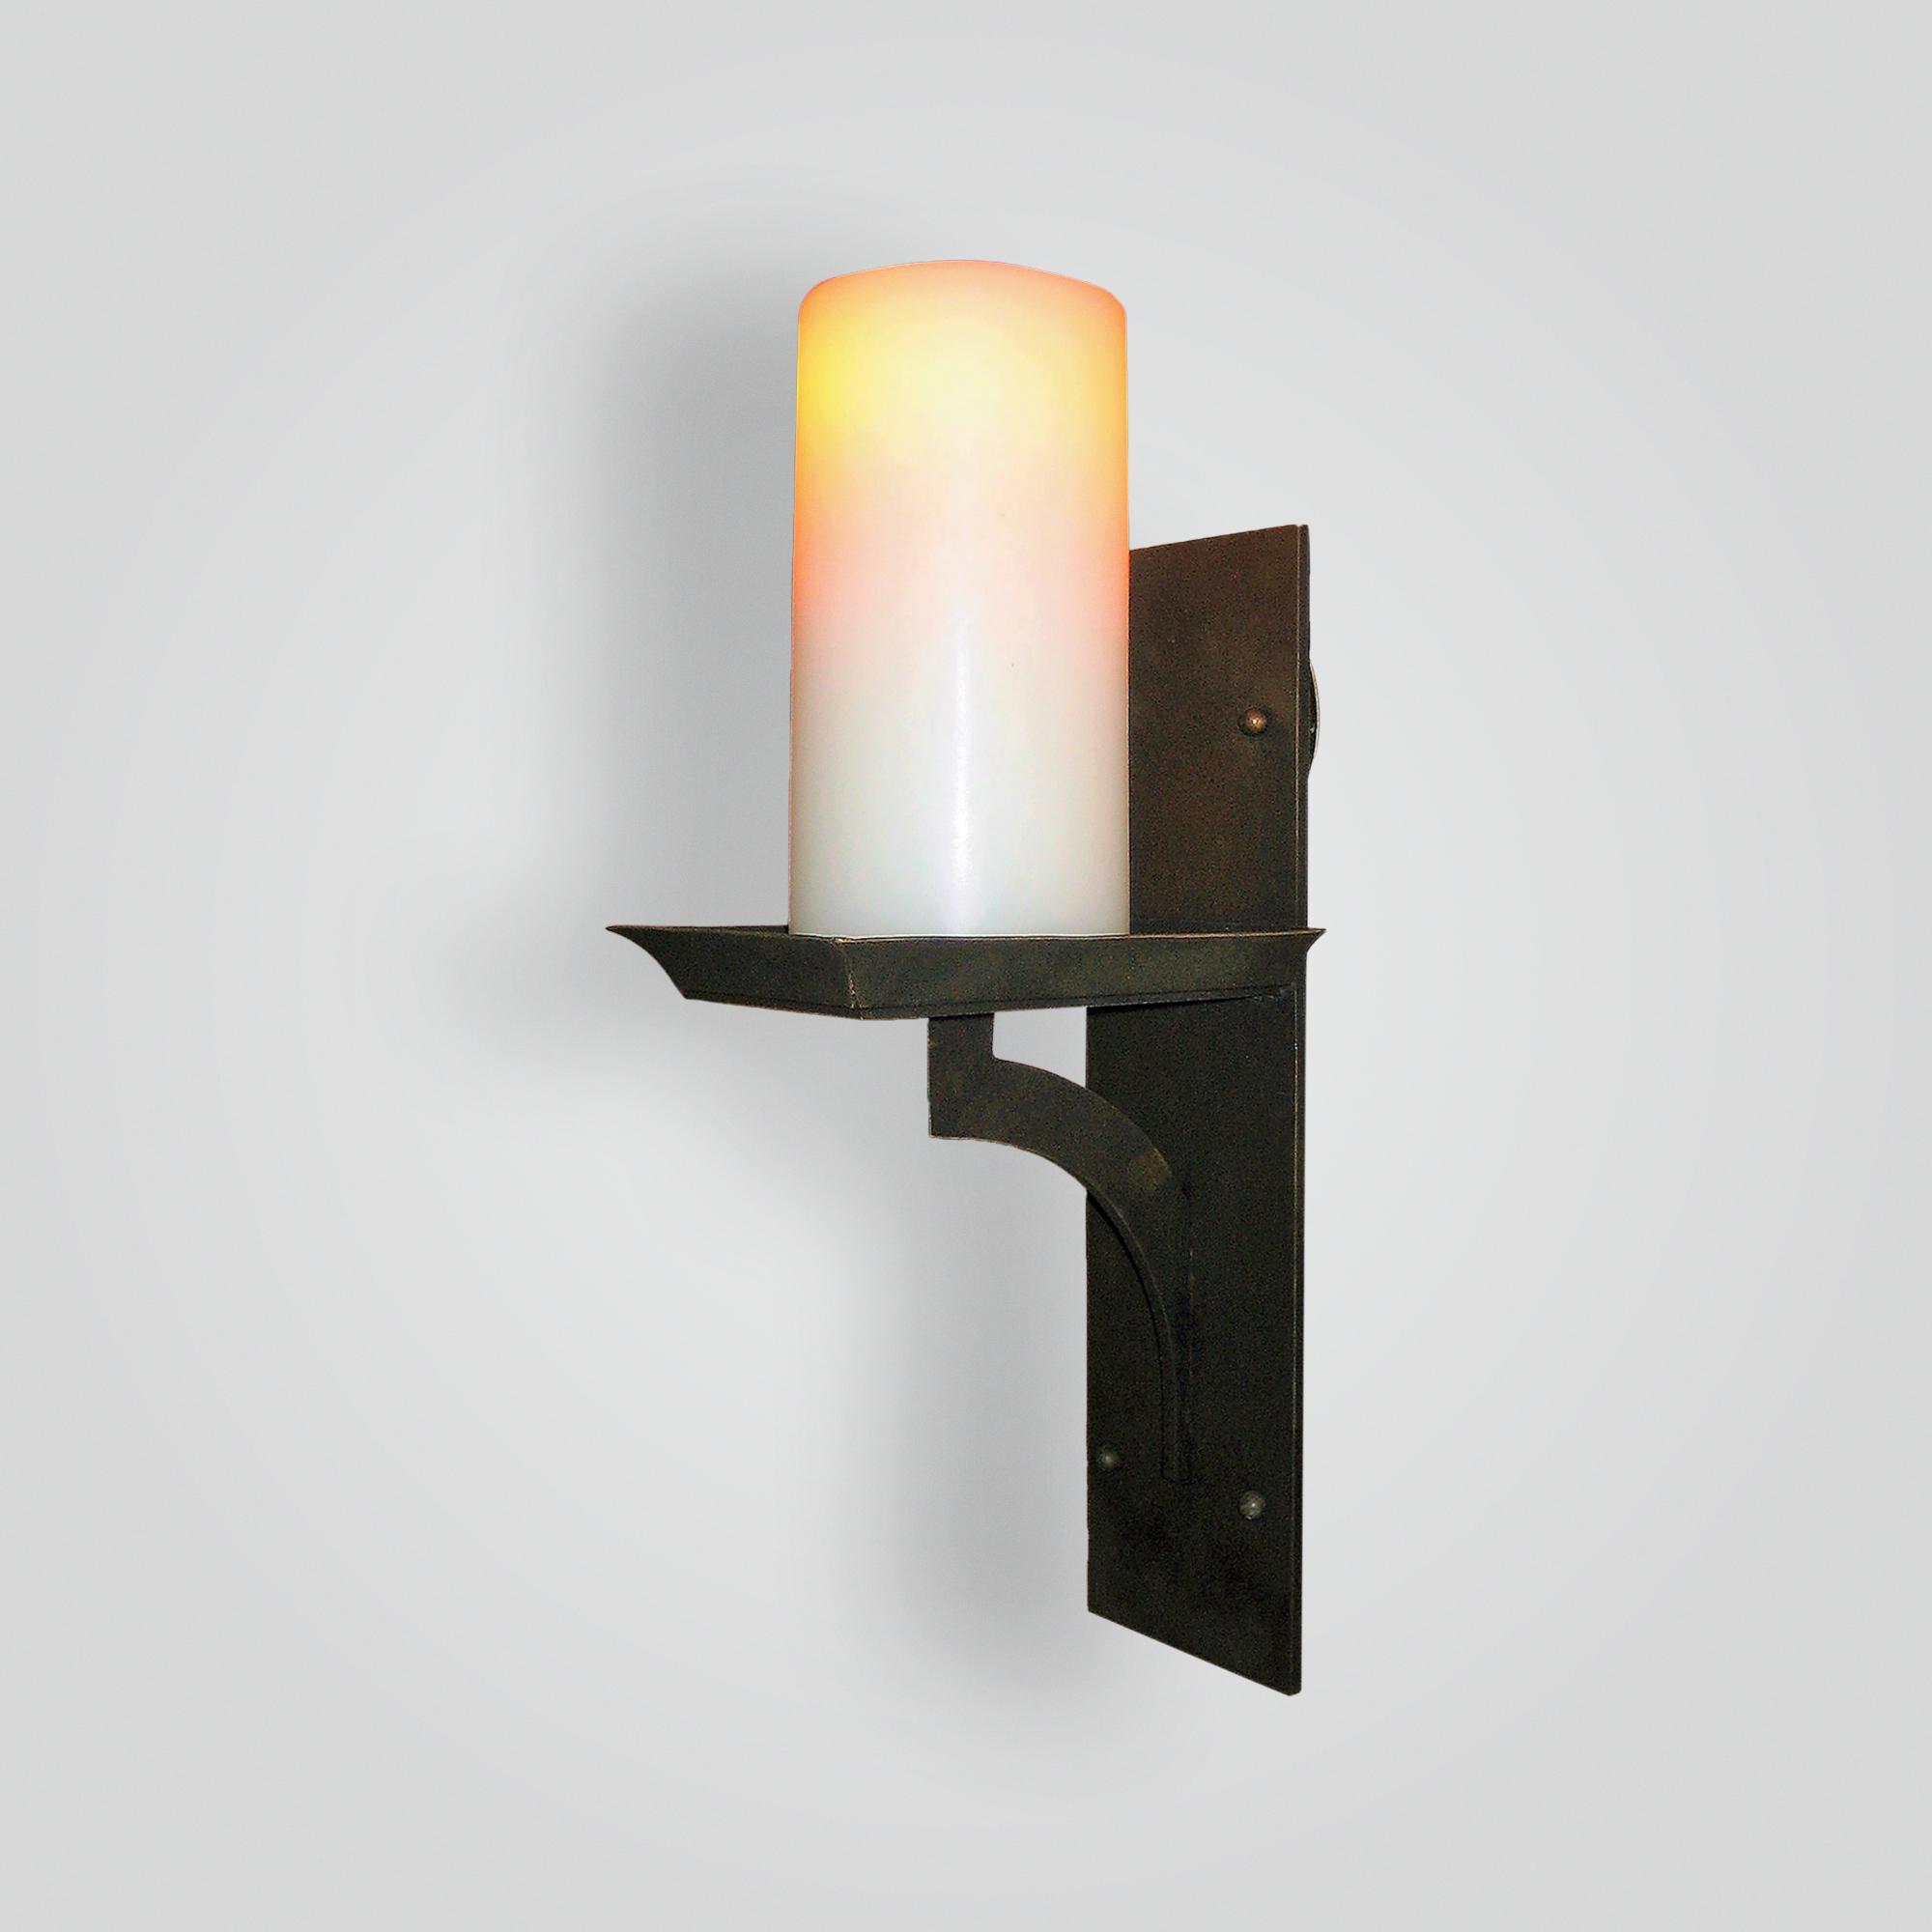 5300-led-br-br-s-ba Oil Rubbed Bronze Sconce – ADG Lighting Collection